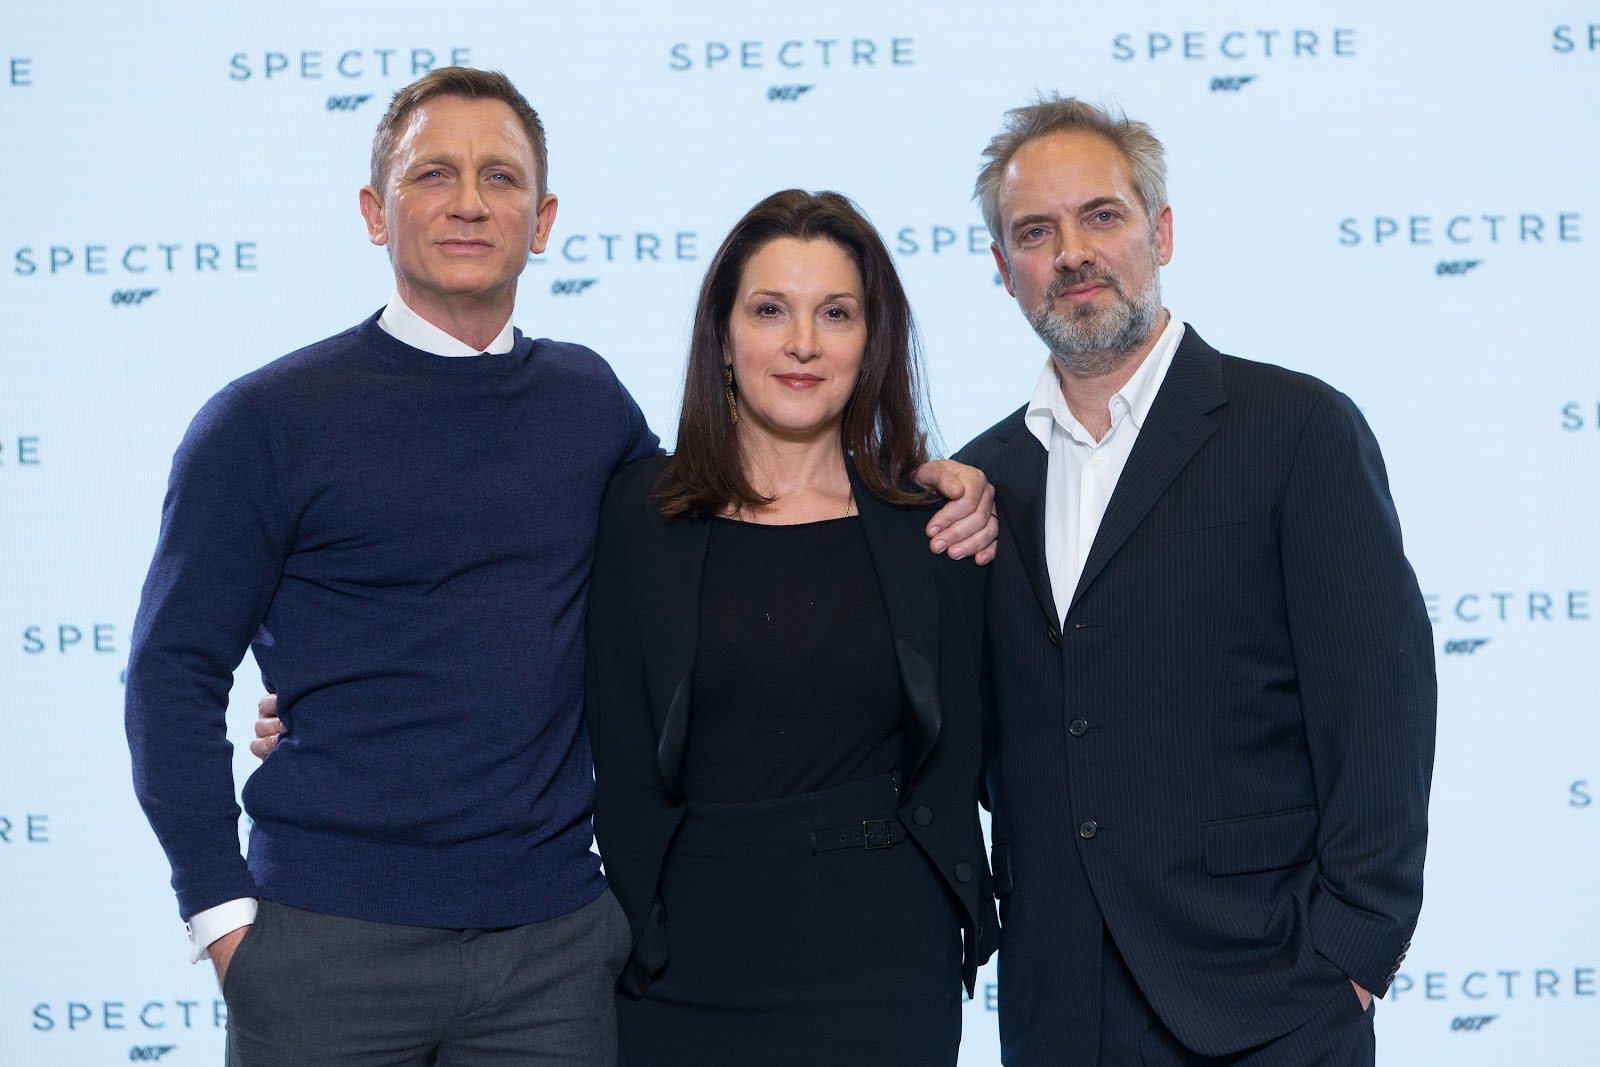 SPECTRE Daniel Craig, Barbara Broccoli, Sam Mendes